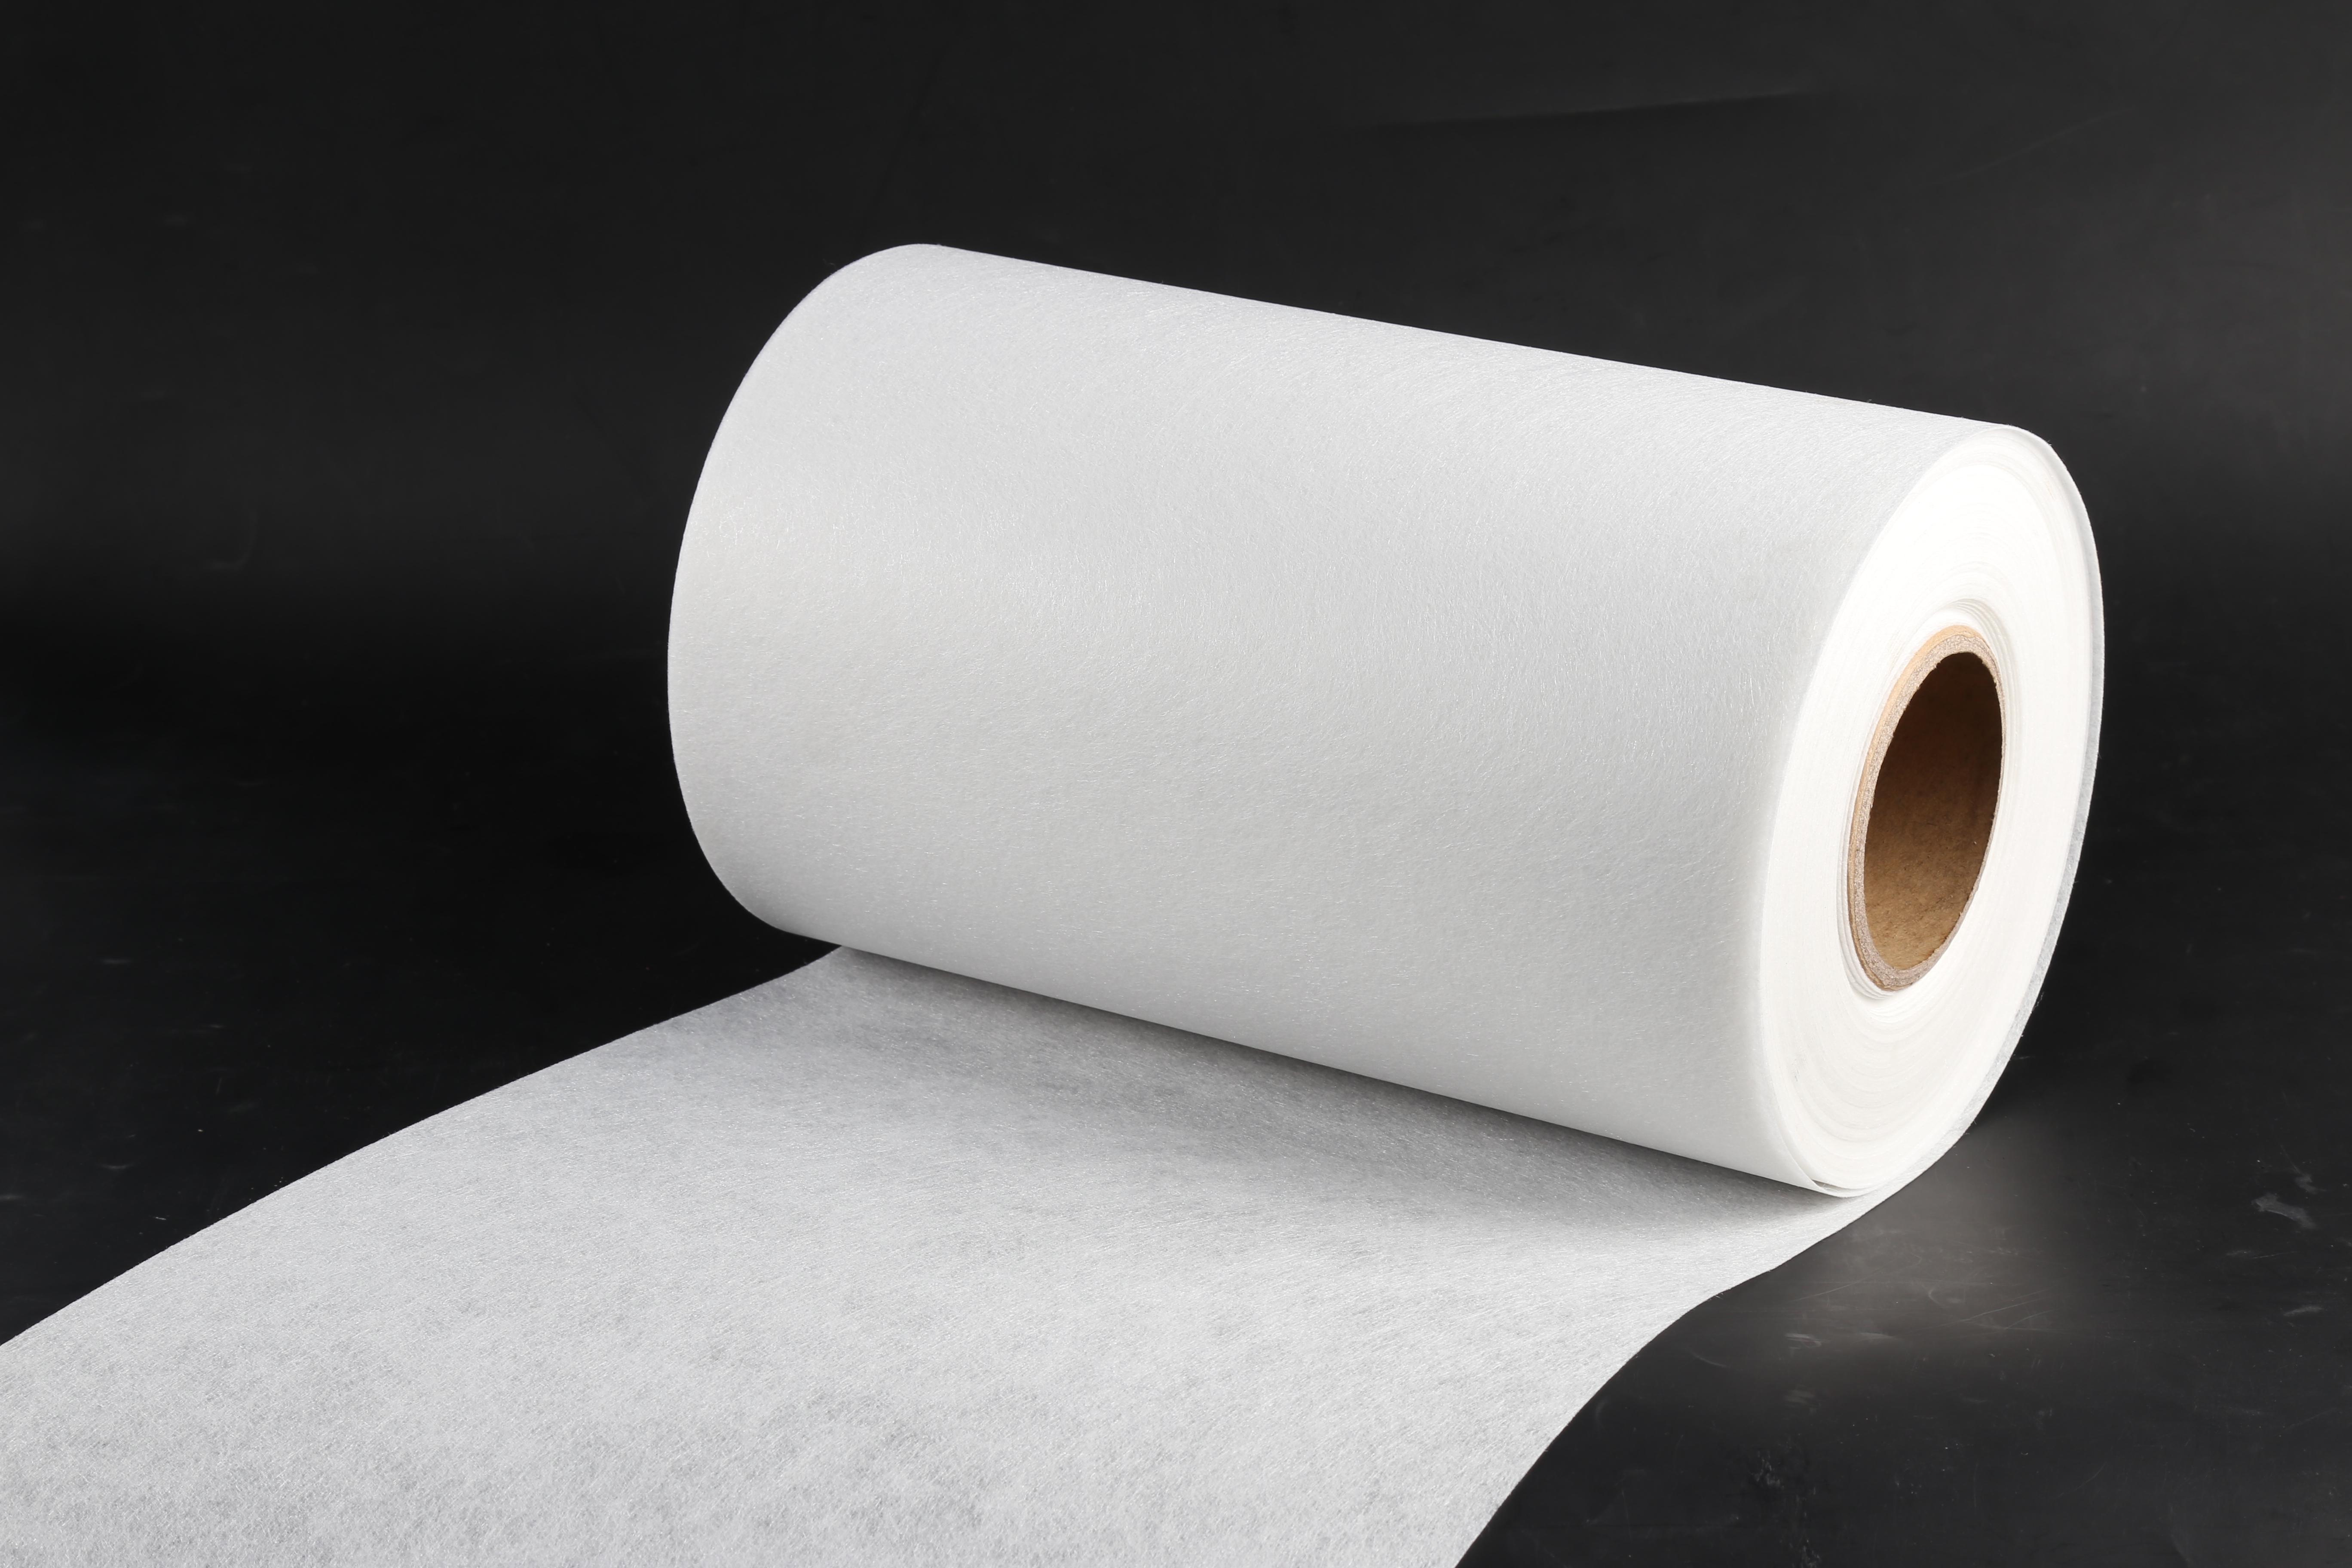 Auto Air Conditioner Filter Cloth Manufacturer Exporter